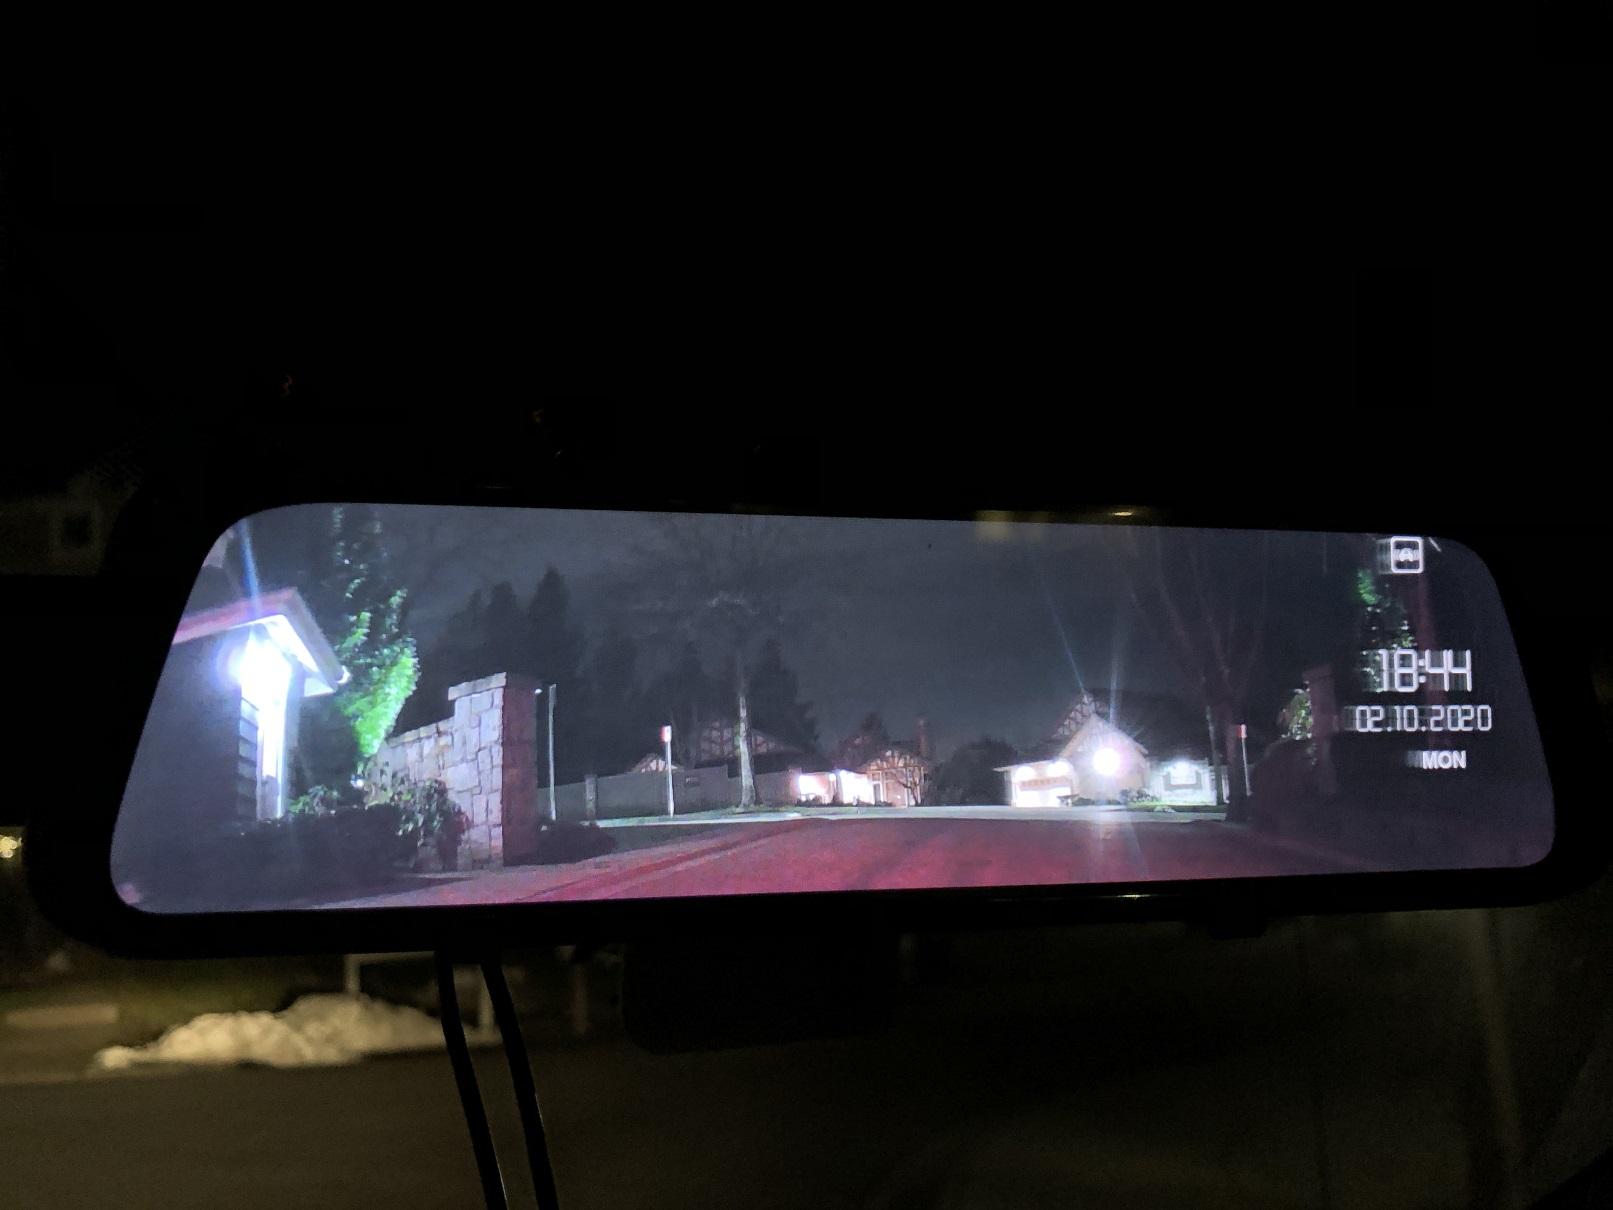 Rexing M1 Dashcam Night View